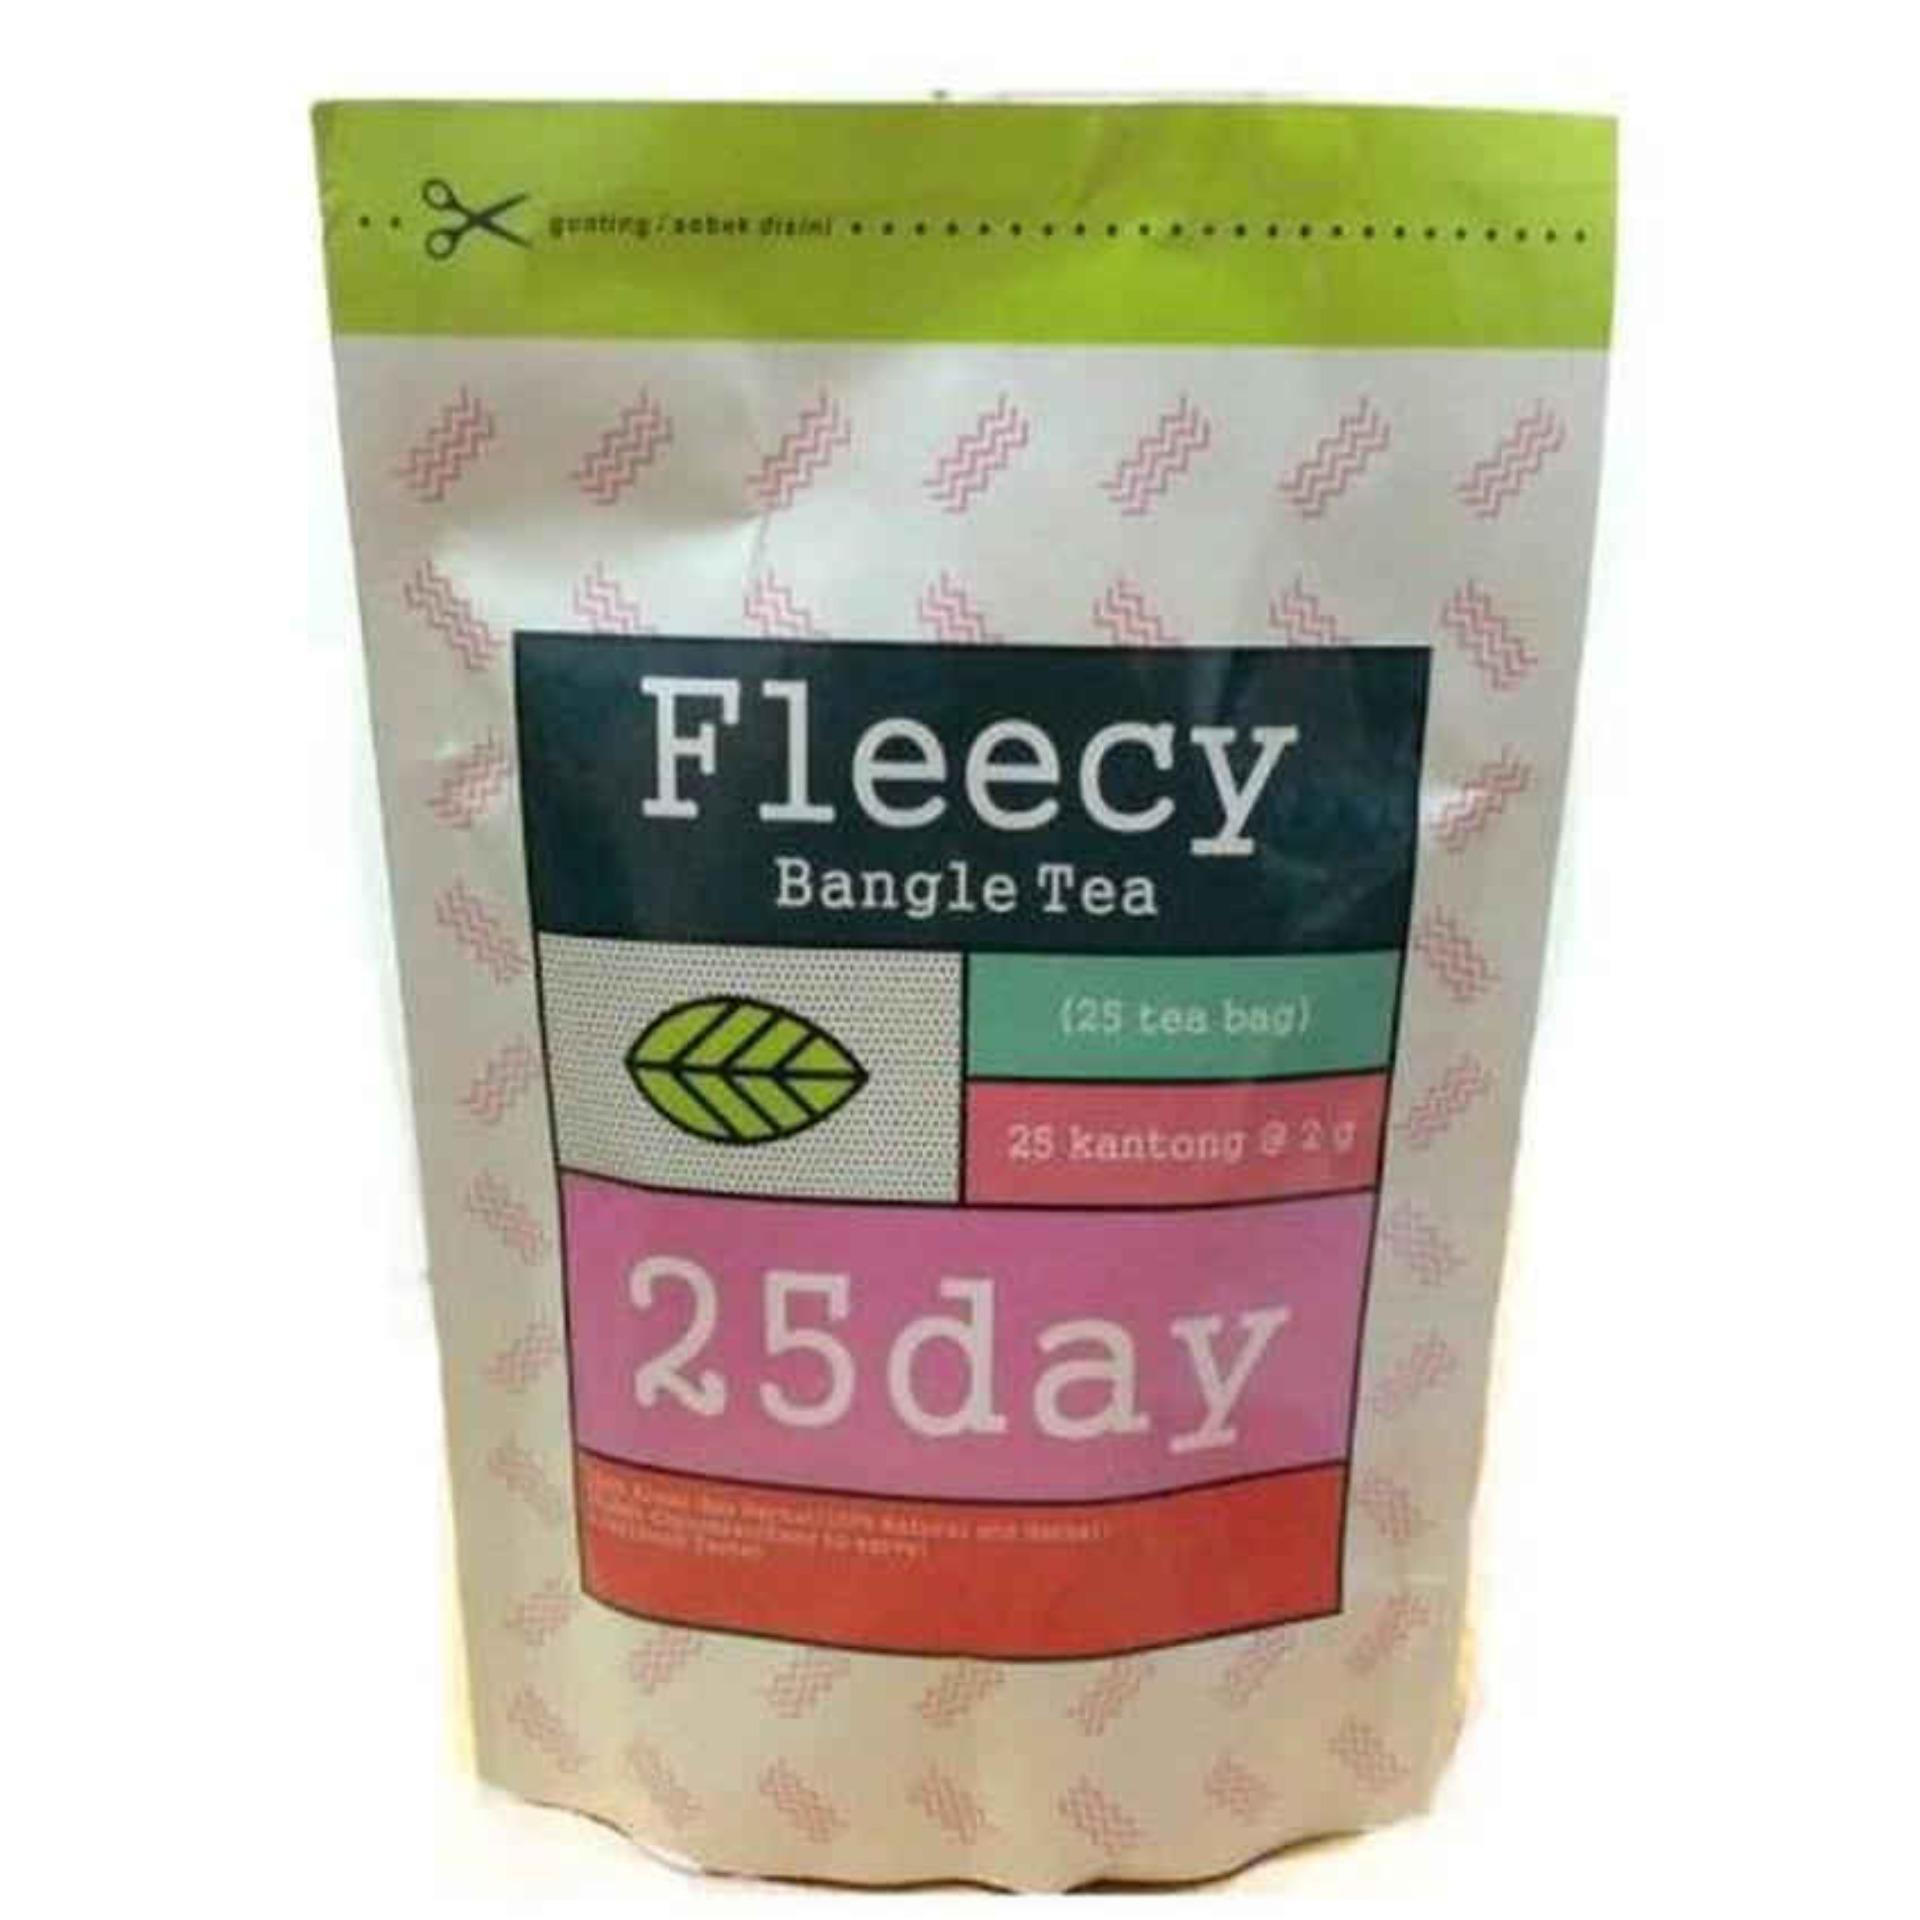 Lucky Silisponge Silicon Sponge Makeup Warna Random 1 Pcs Collagen Source · Harga Fleecy Bangle Tea